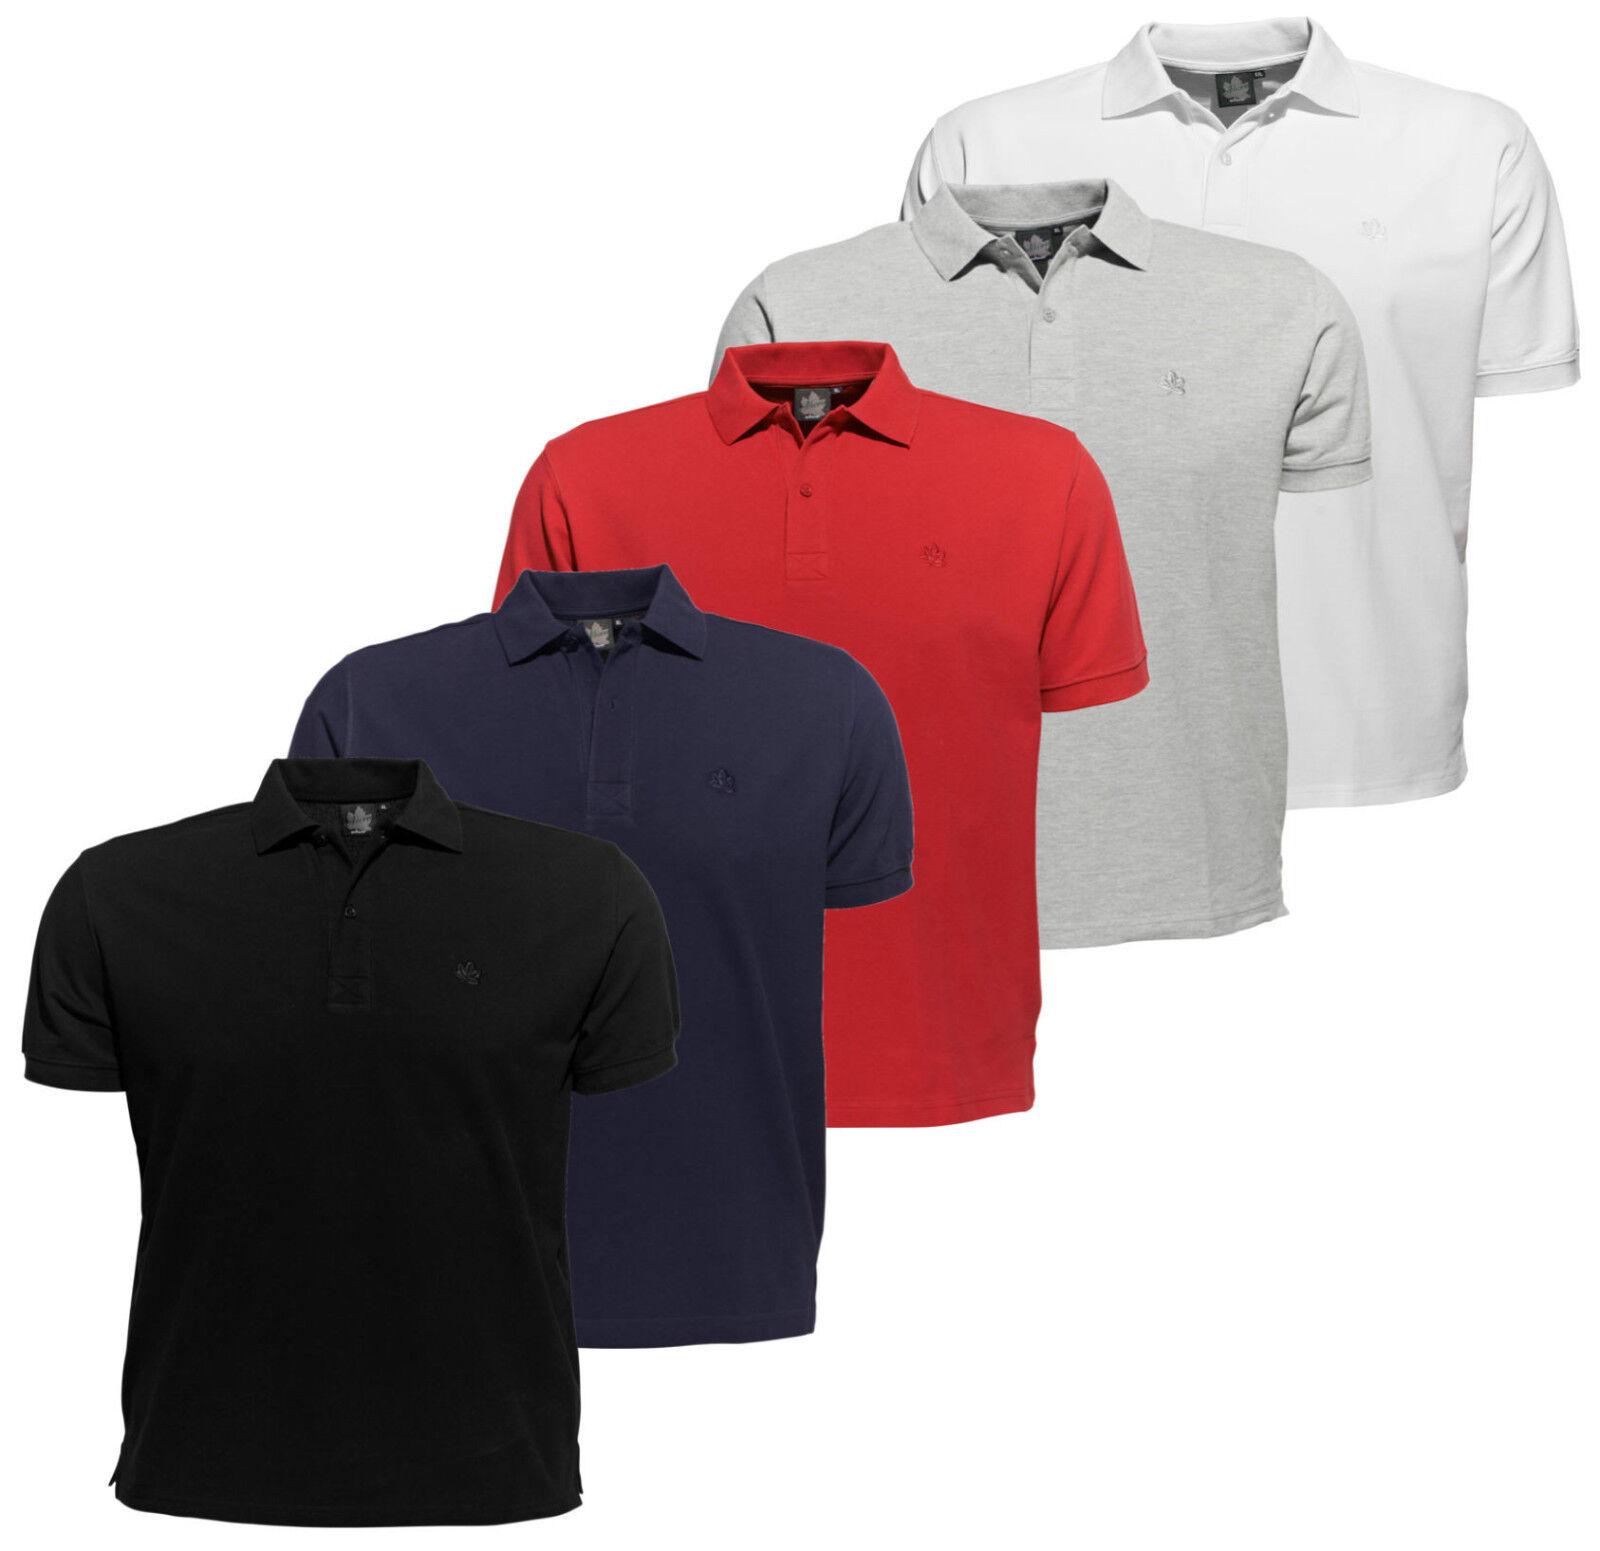 AHORN Polo Shirt XL-54 56 BIS 10XL-82 84 Übergröße T-Shirt Polo-Shirt  Kurzarm